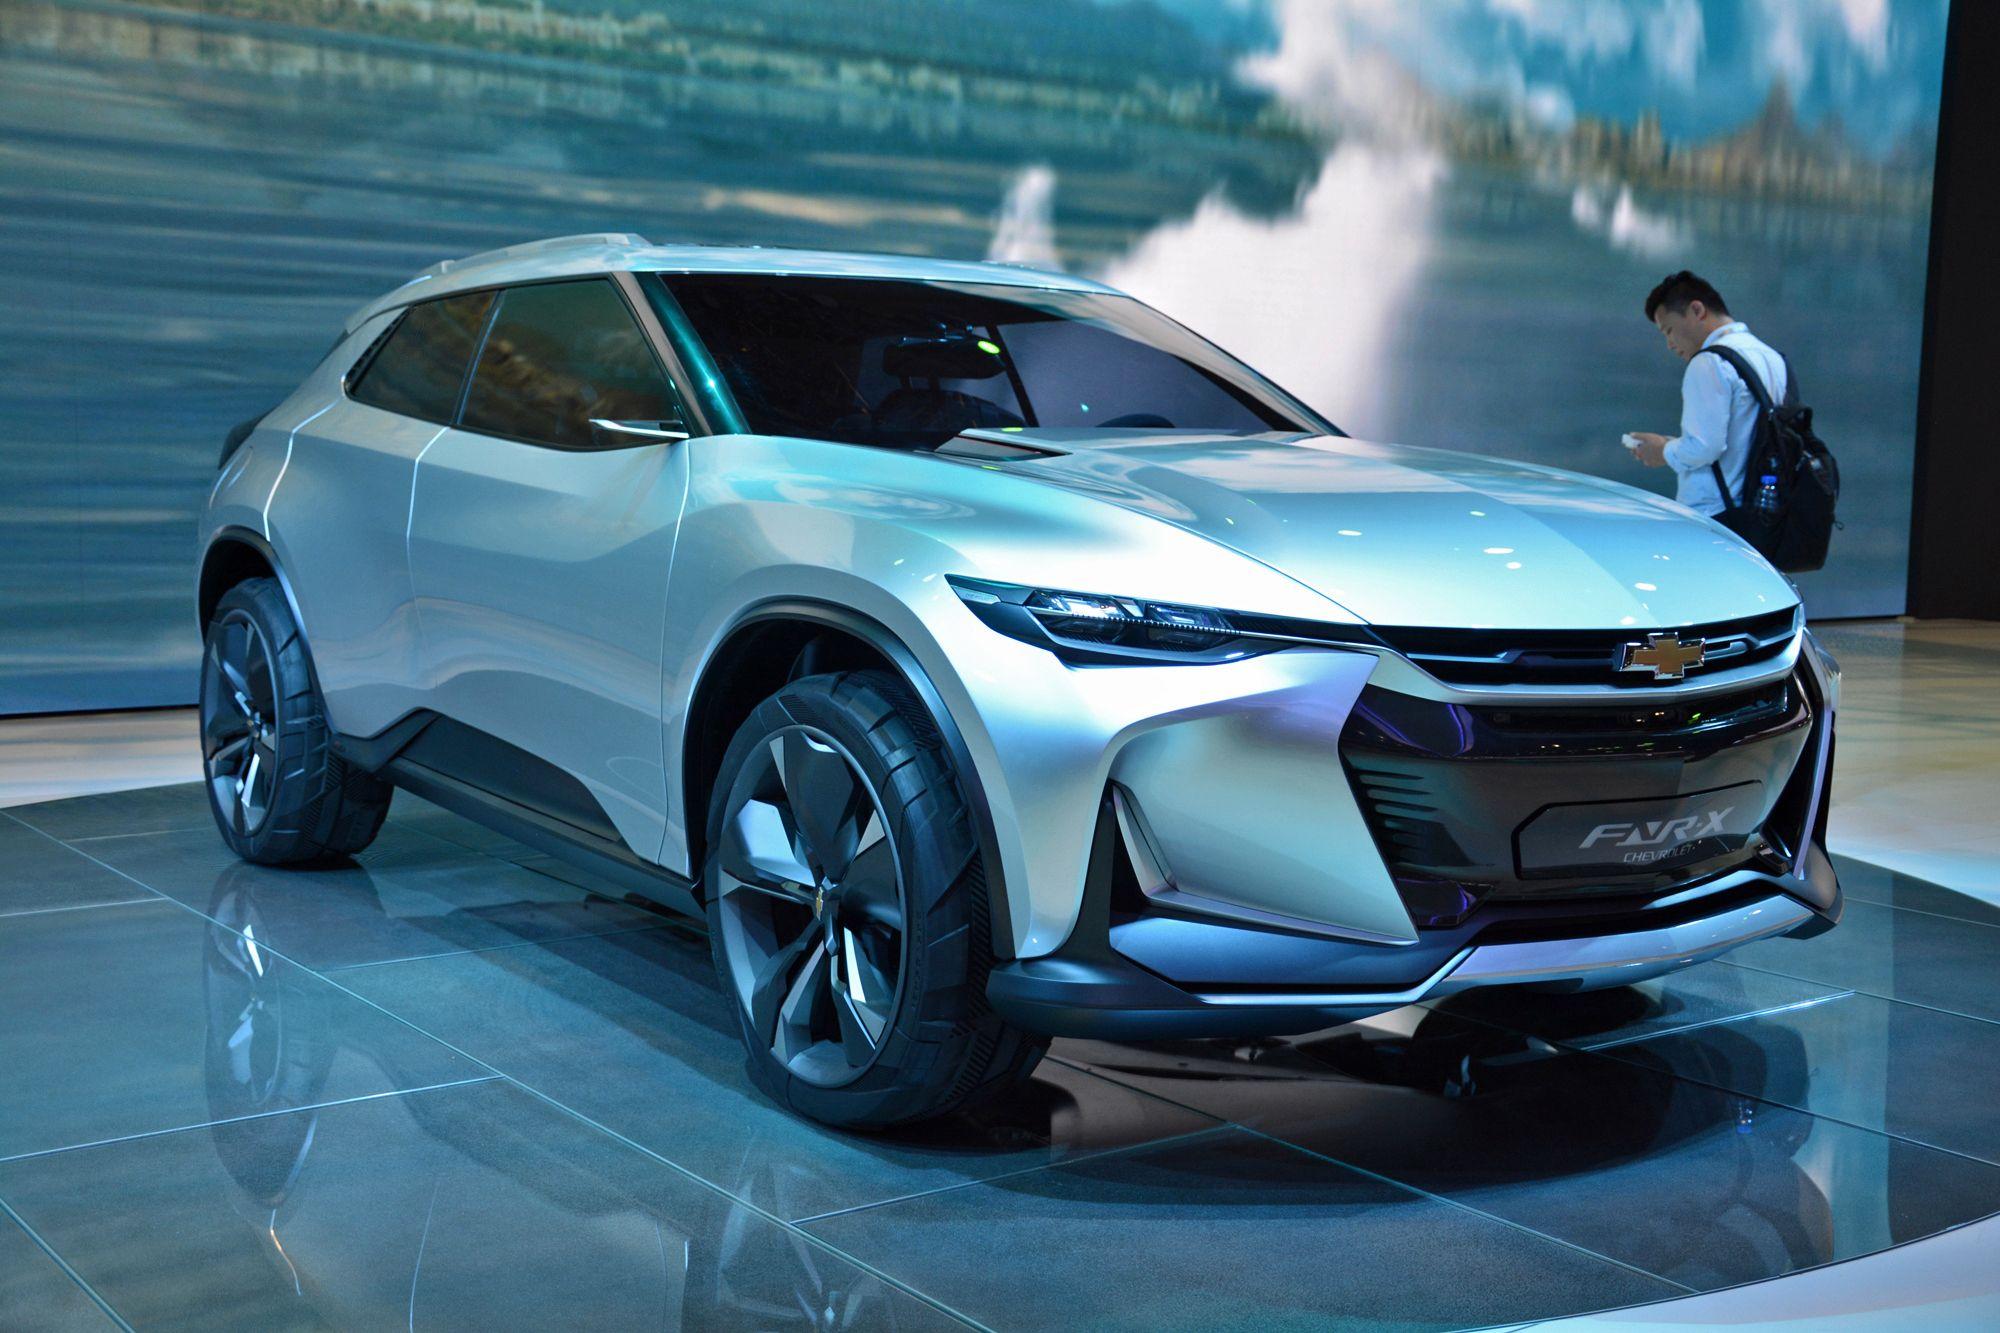 Chevrolet Hybrid 2020 Release Date In 2020 Chevrolet Chevy